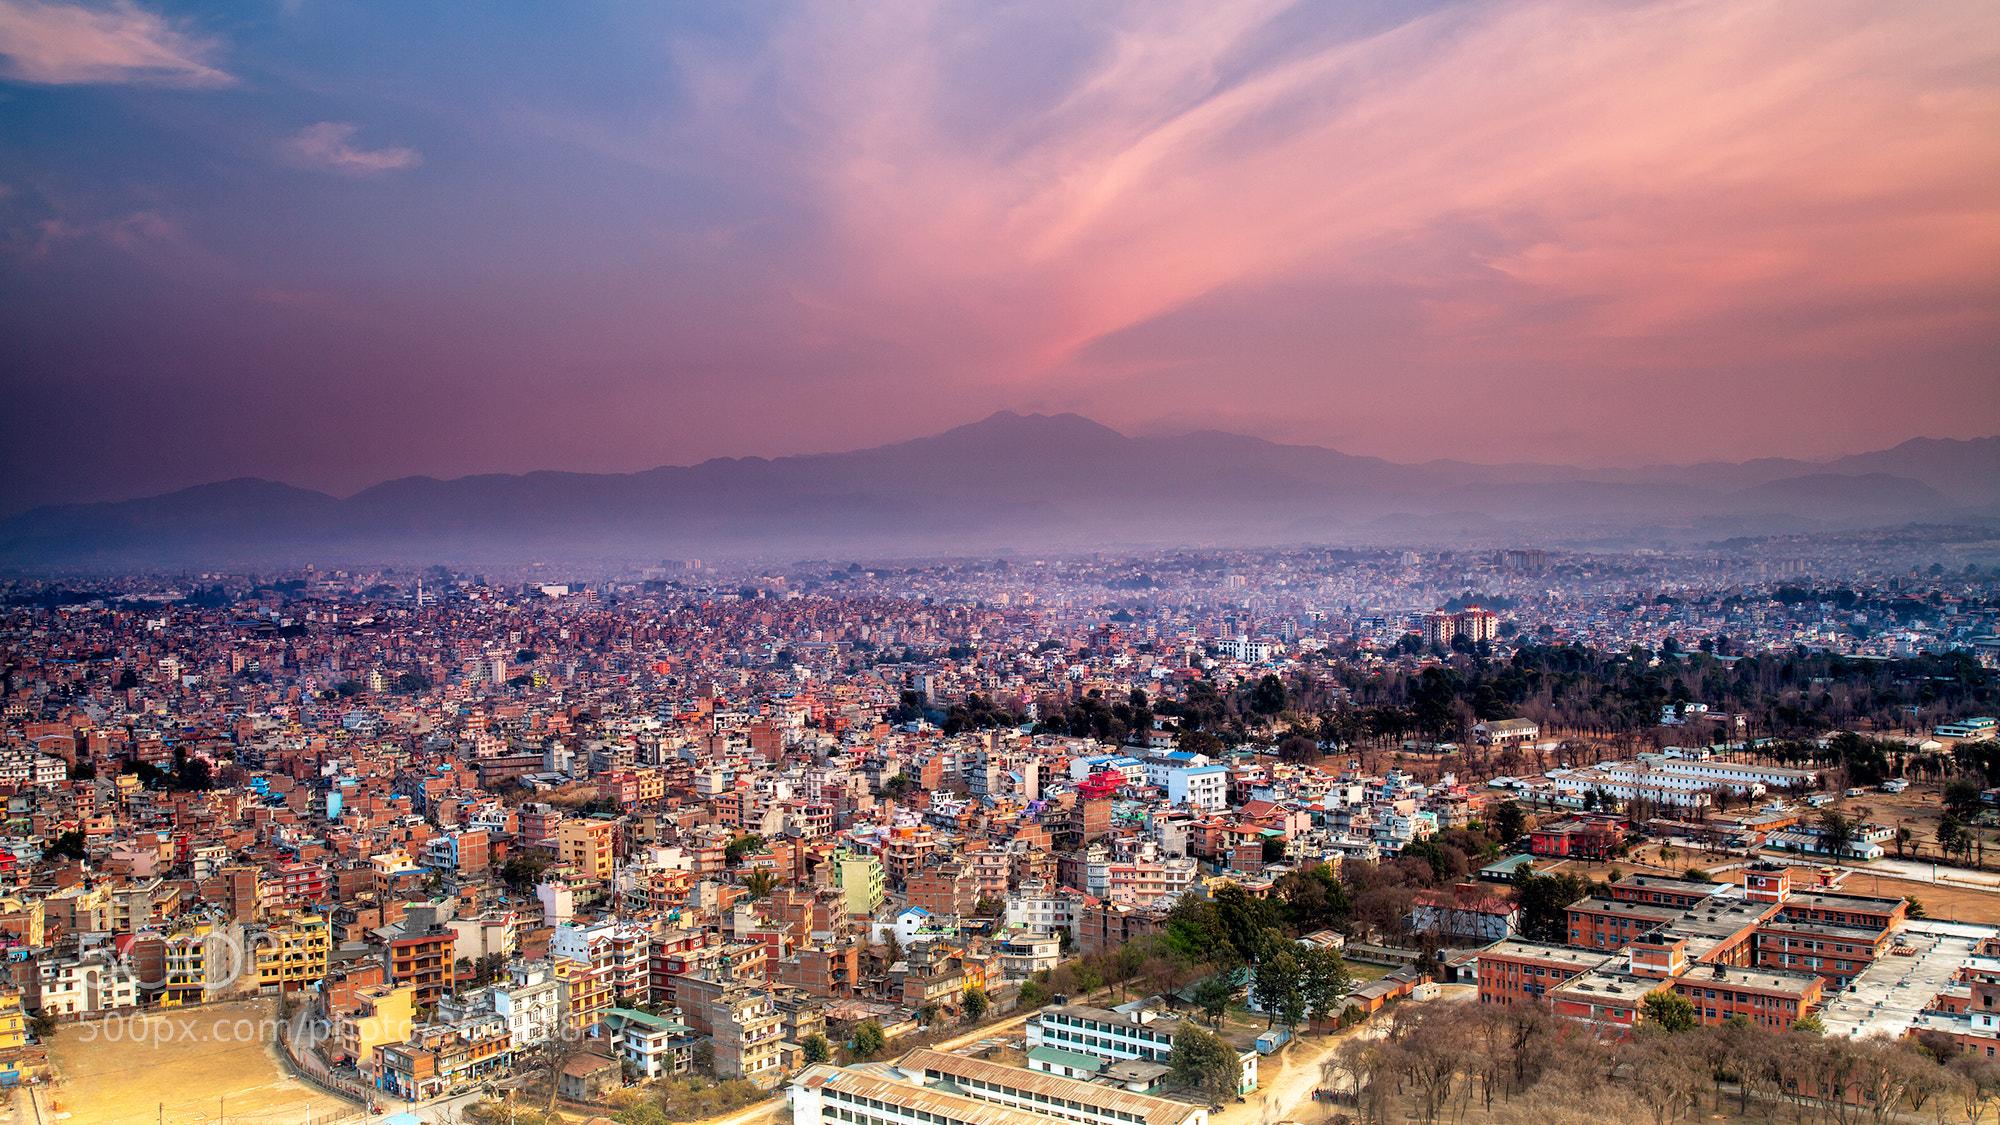 Photograph Kathmandu City by Helminadia Ranford on 500px